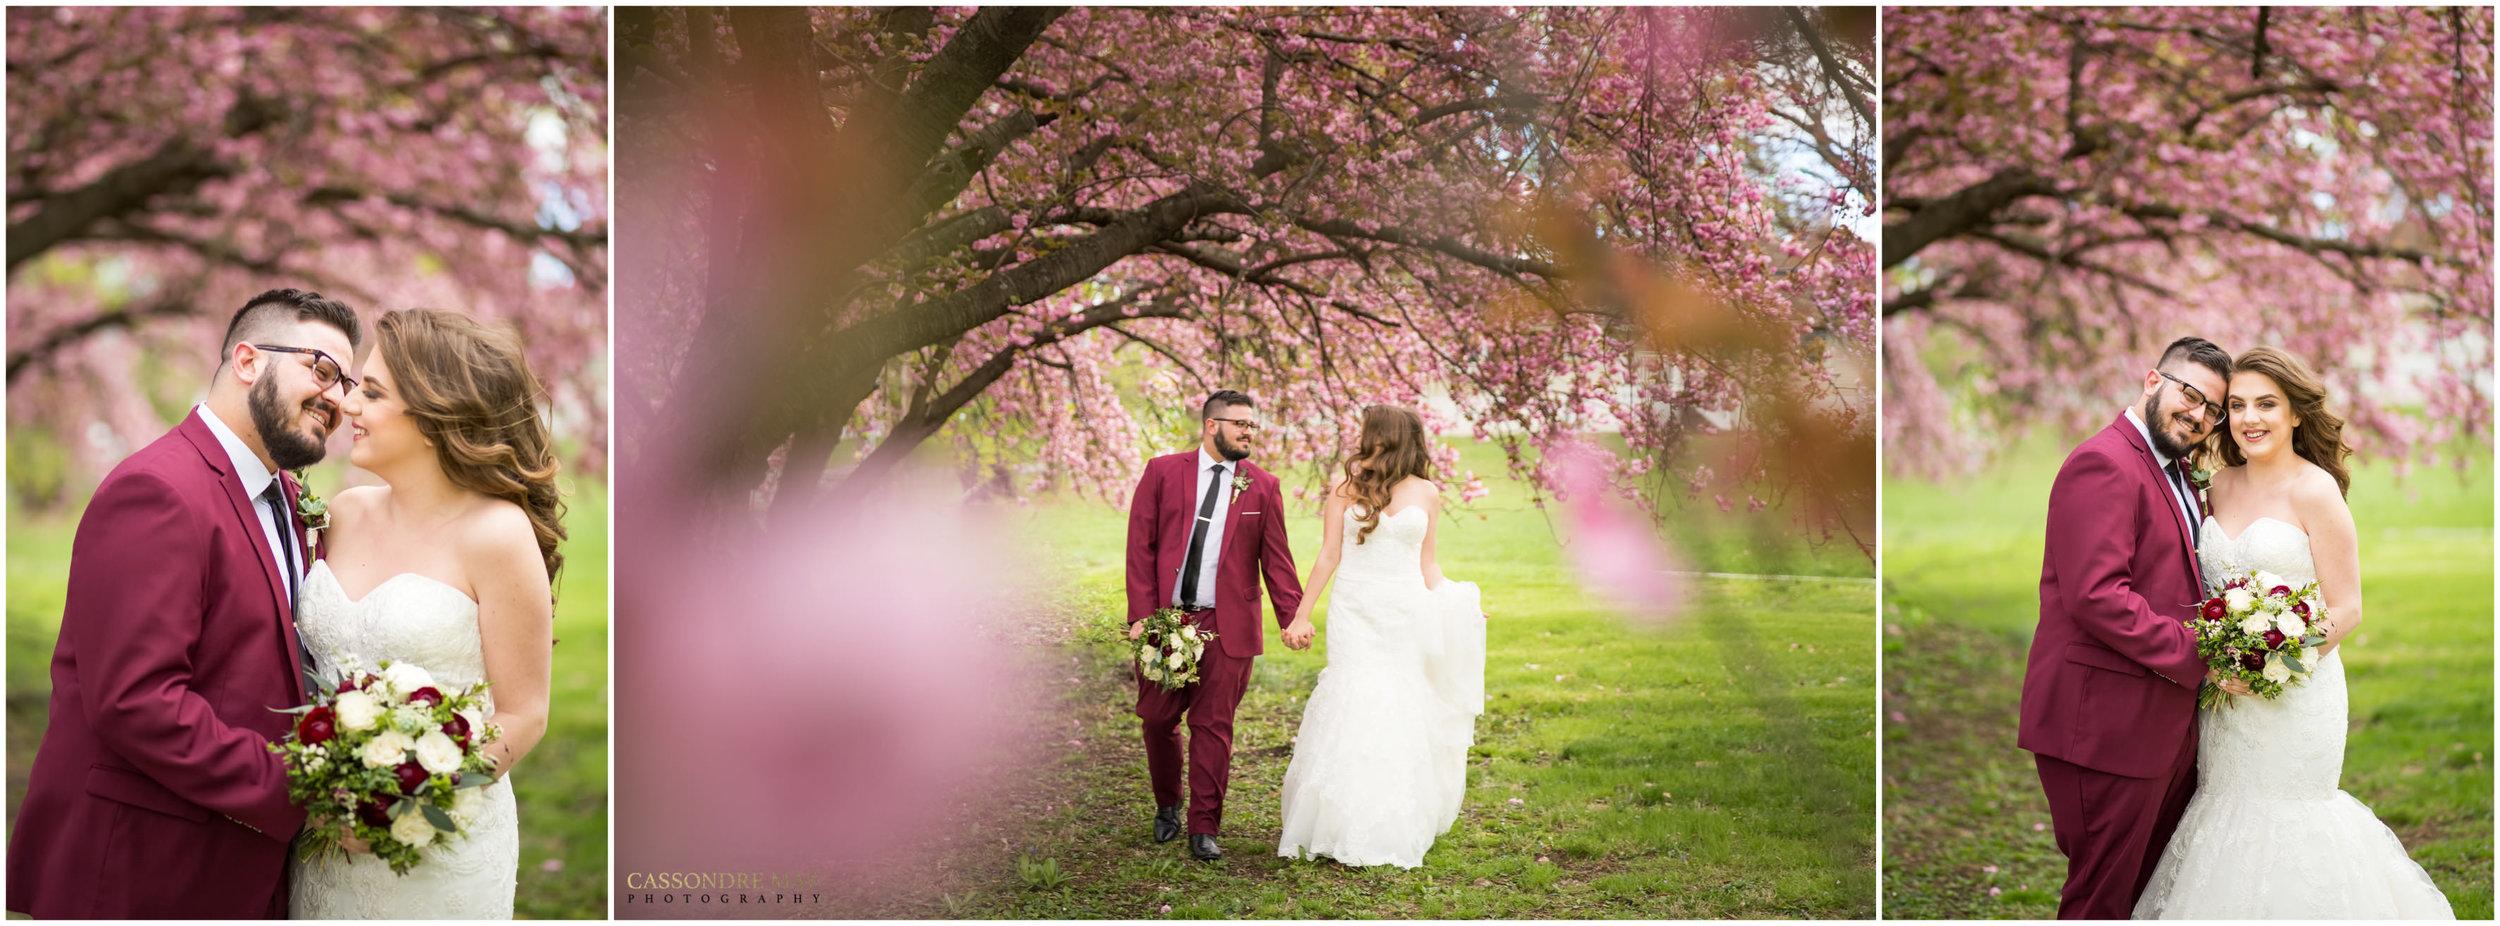 Cassondre Mae Photography Cove Castle Weddings 2.jpg